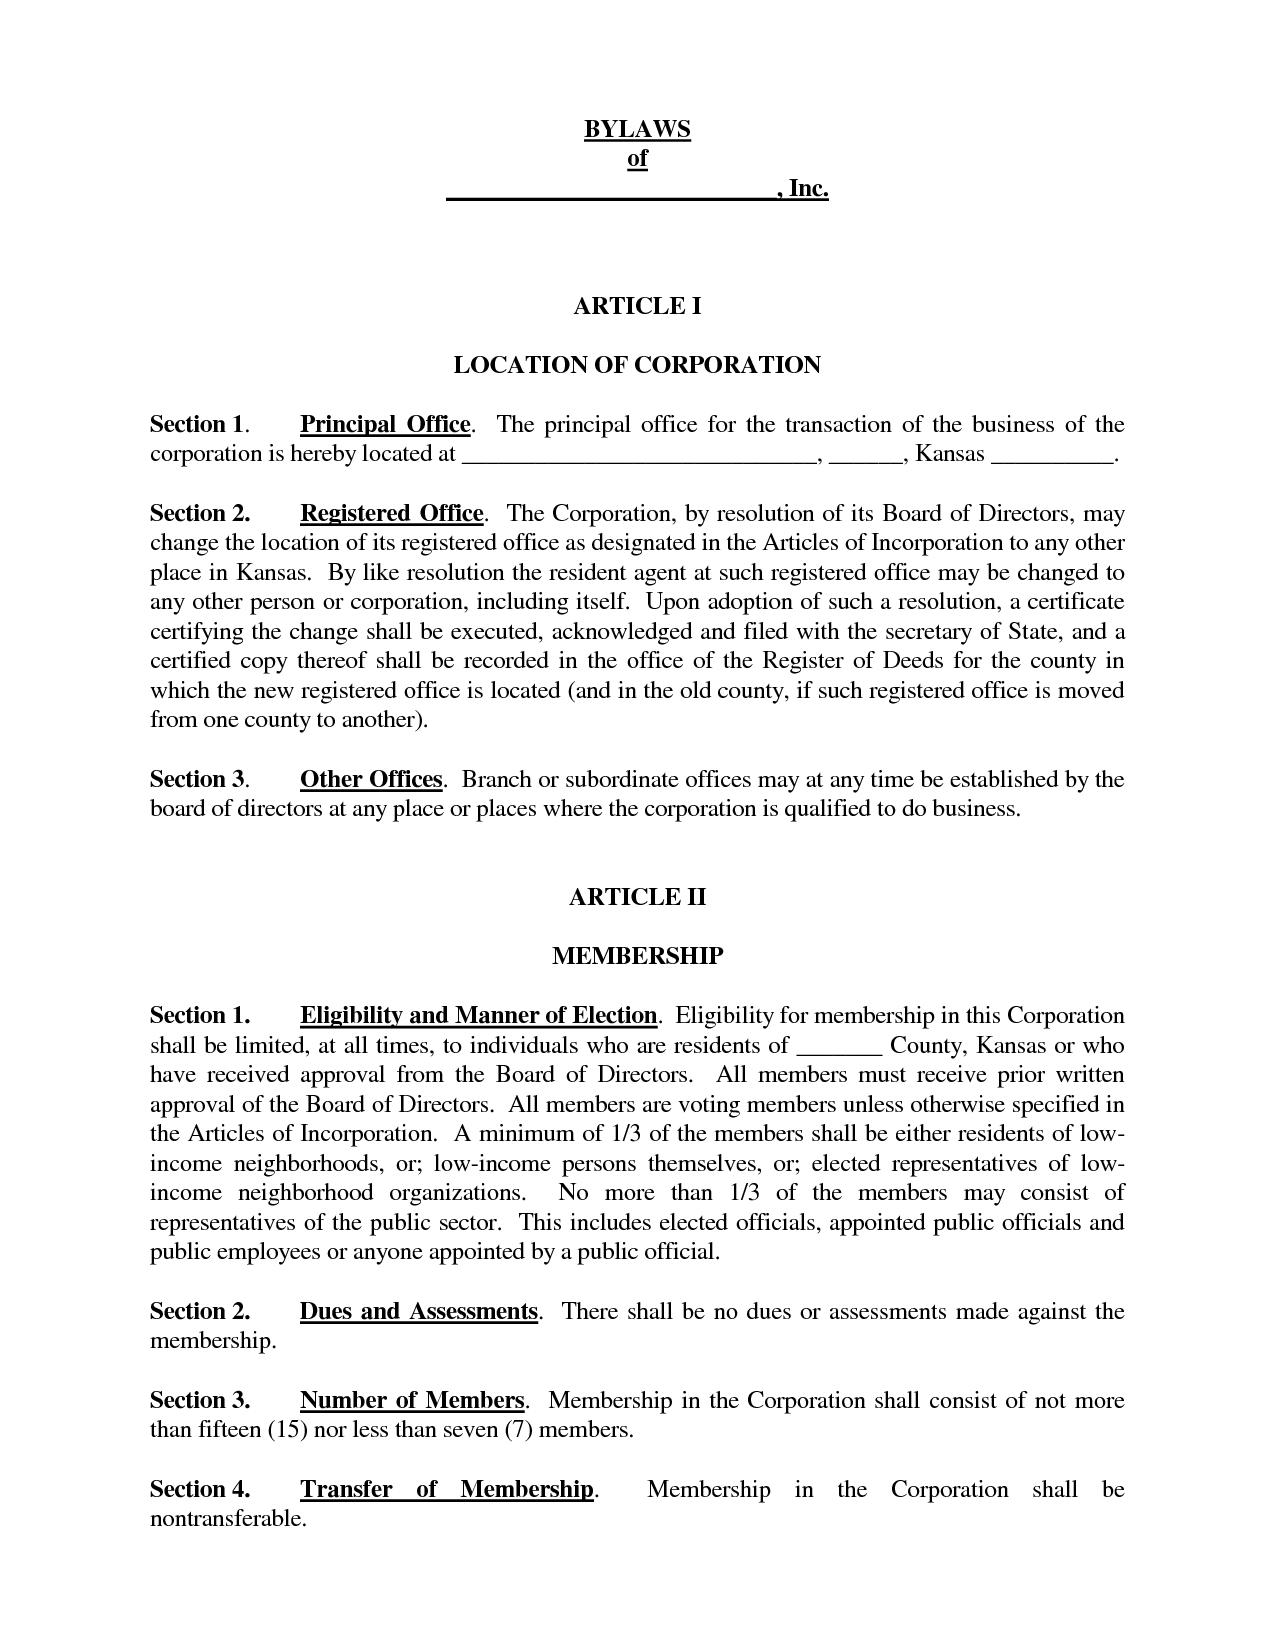 Doc623554 Bylaw Template Nonprofit Bylaws 76 Similar Docs – Church Bylaws Template